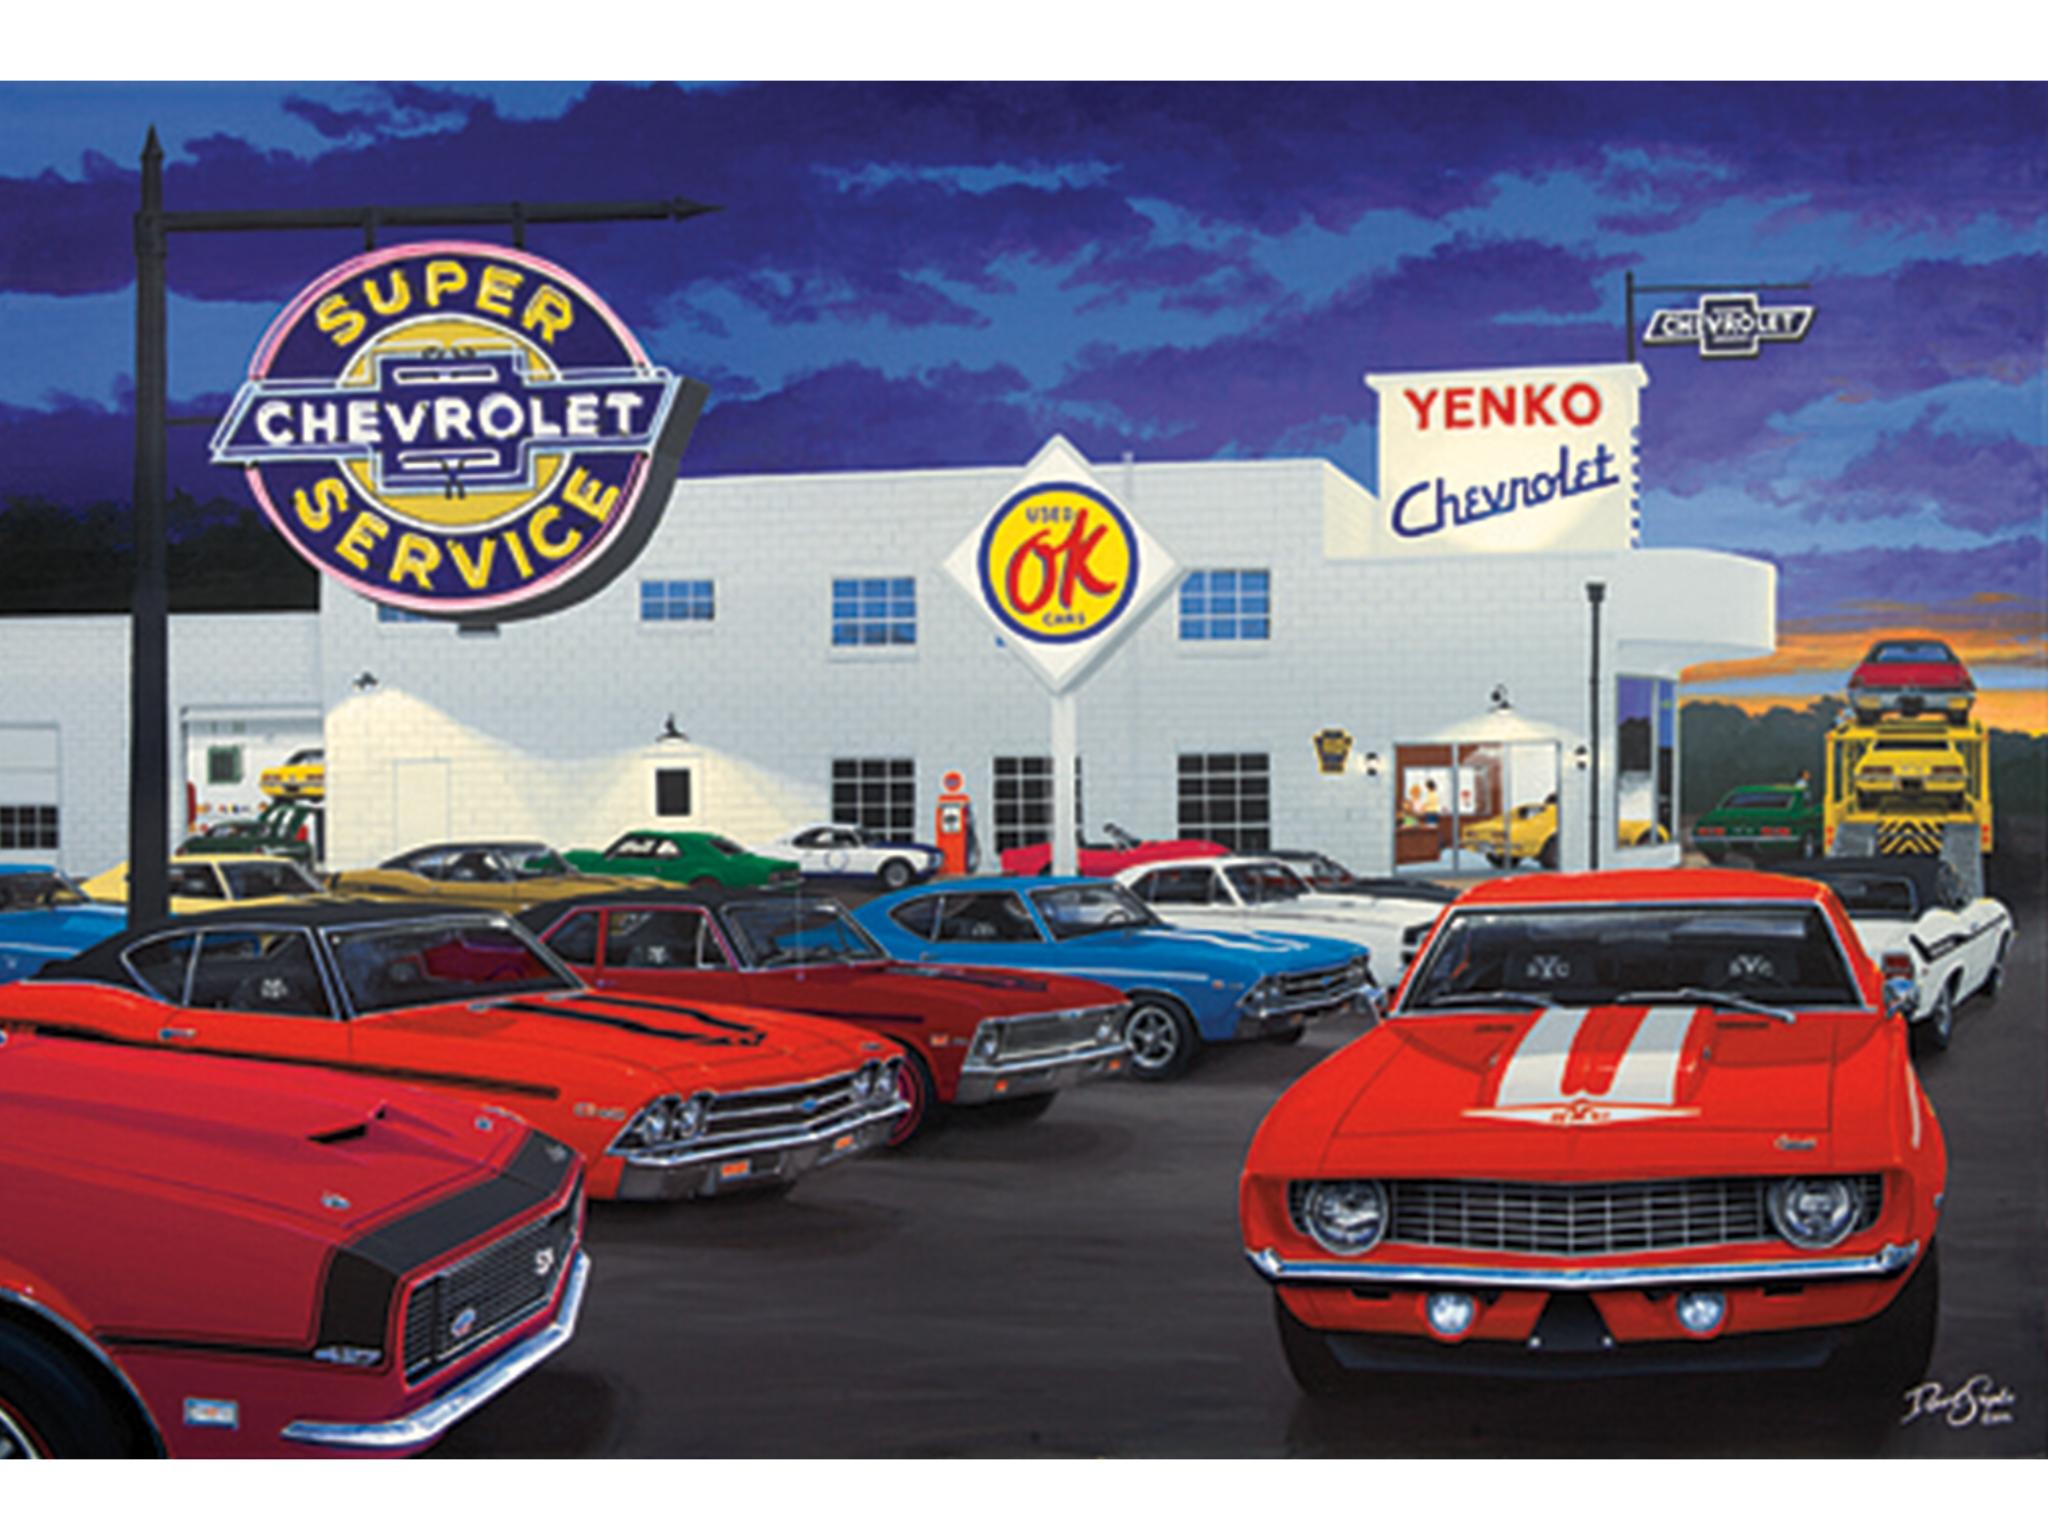 Yenko Chevrolet Dealership Cannonsburg Pennsylvania Chevrolet Dealership Car Prints Chevrolet